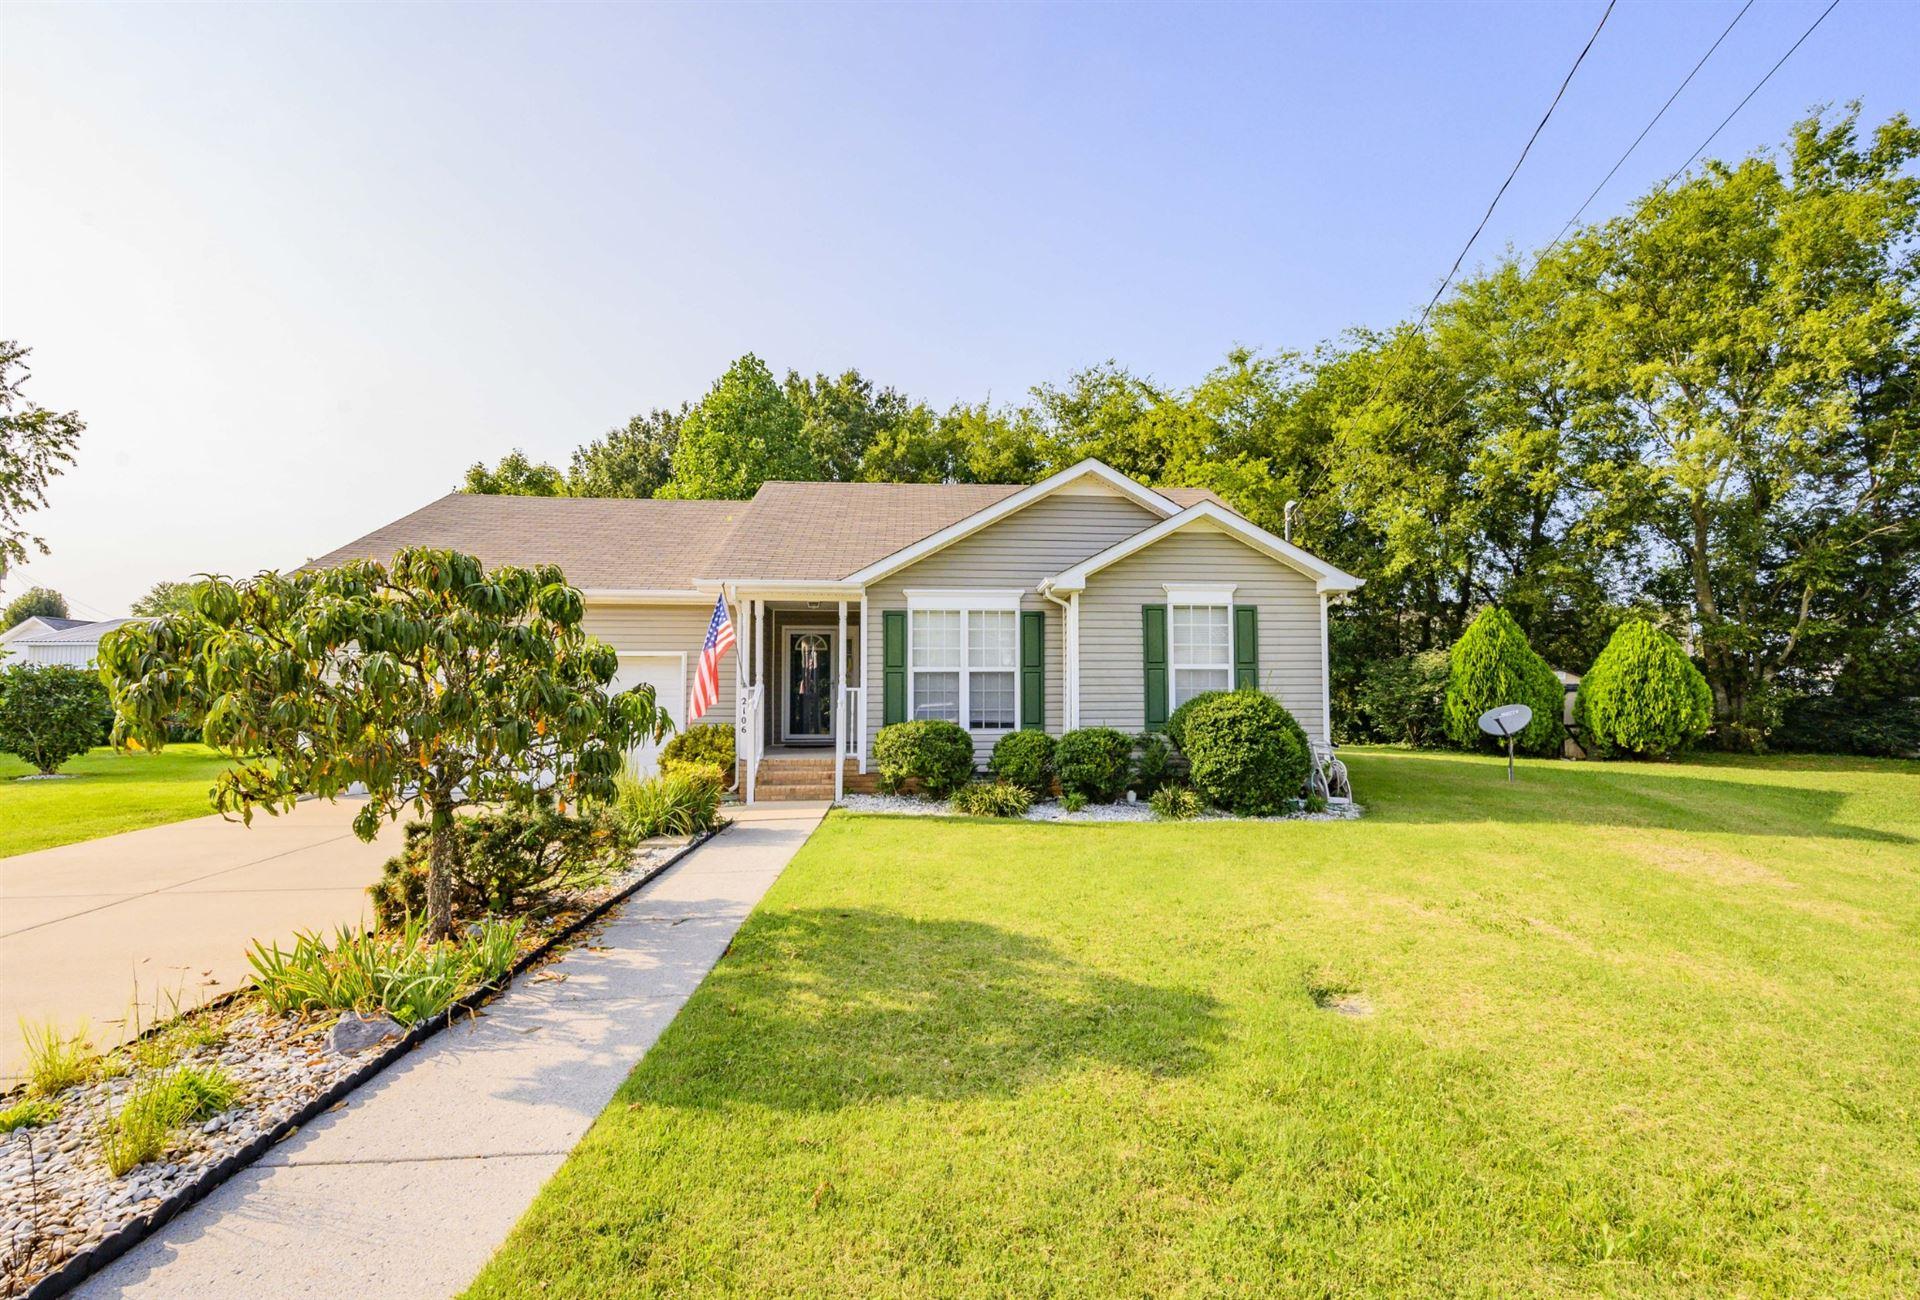 2106 Golfield Ct, Murfreesboro, TN 37127 - MLS#: 2187848